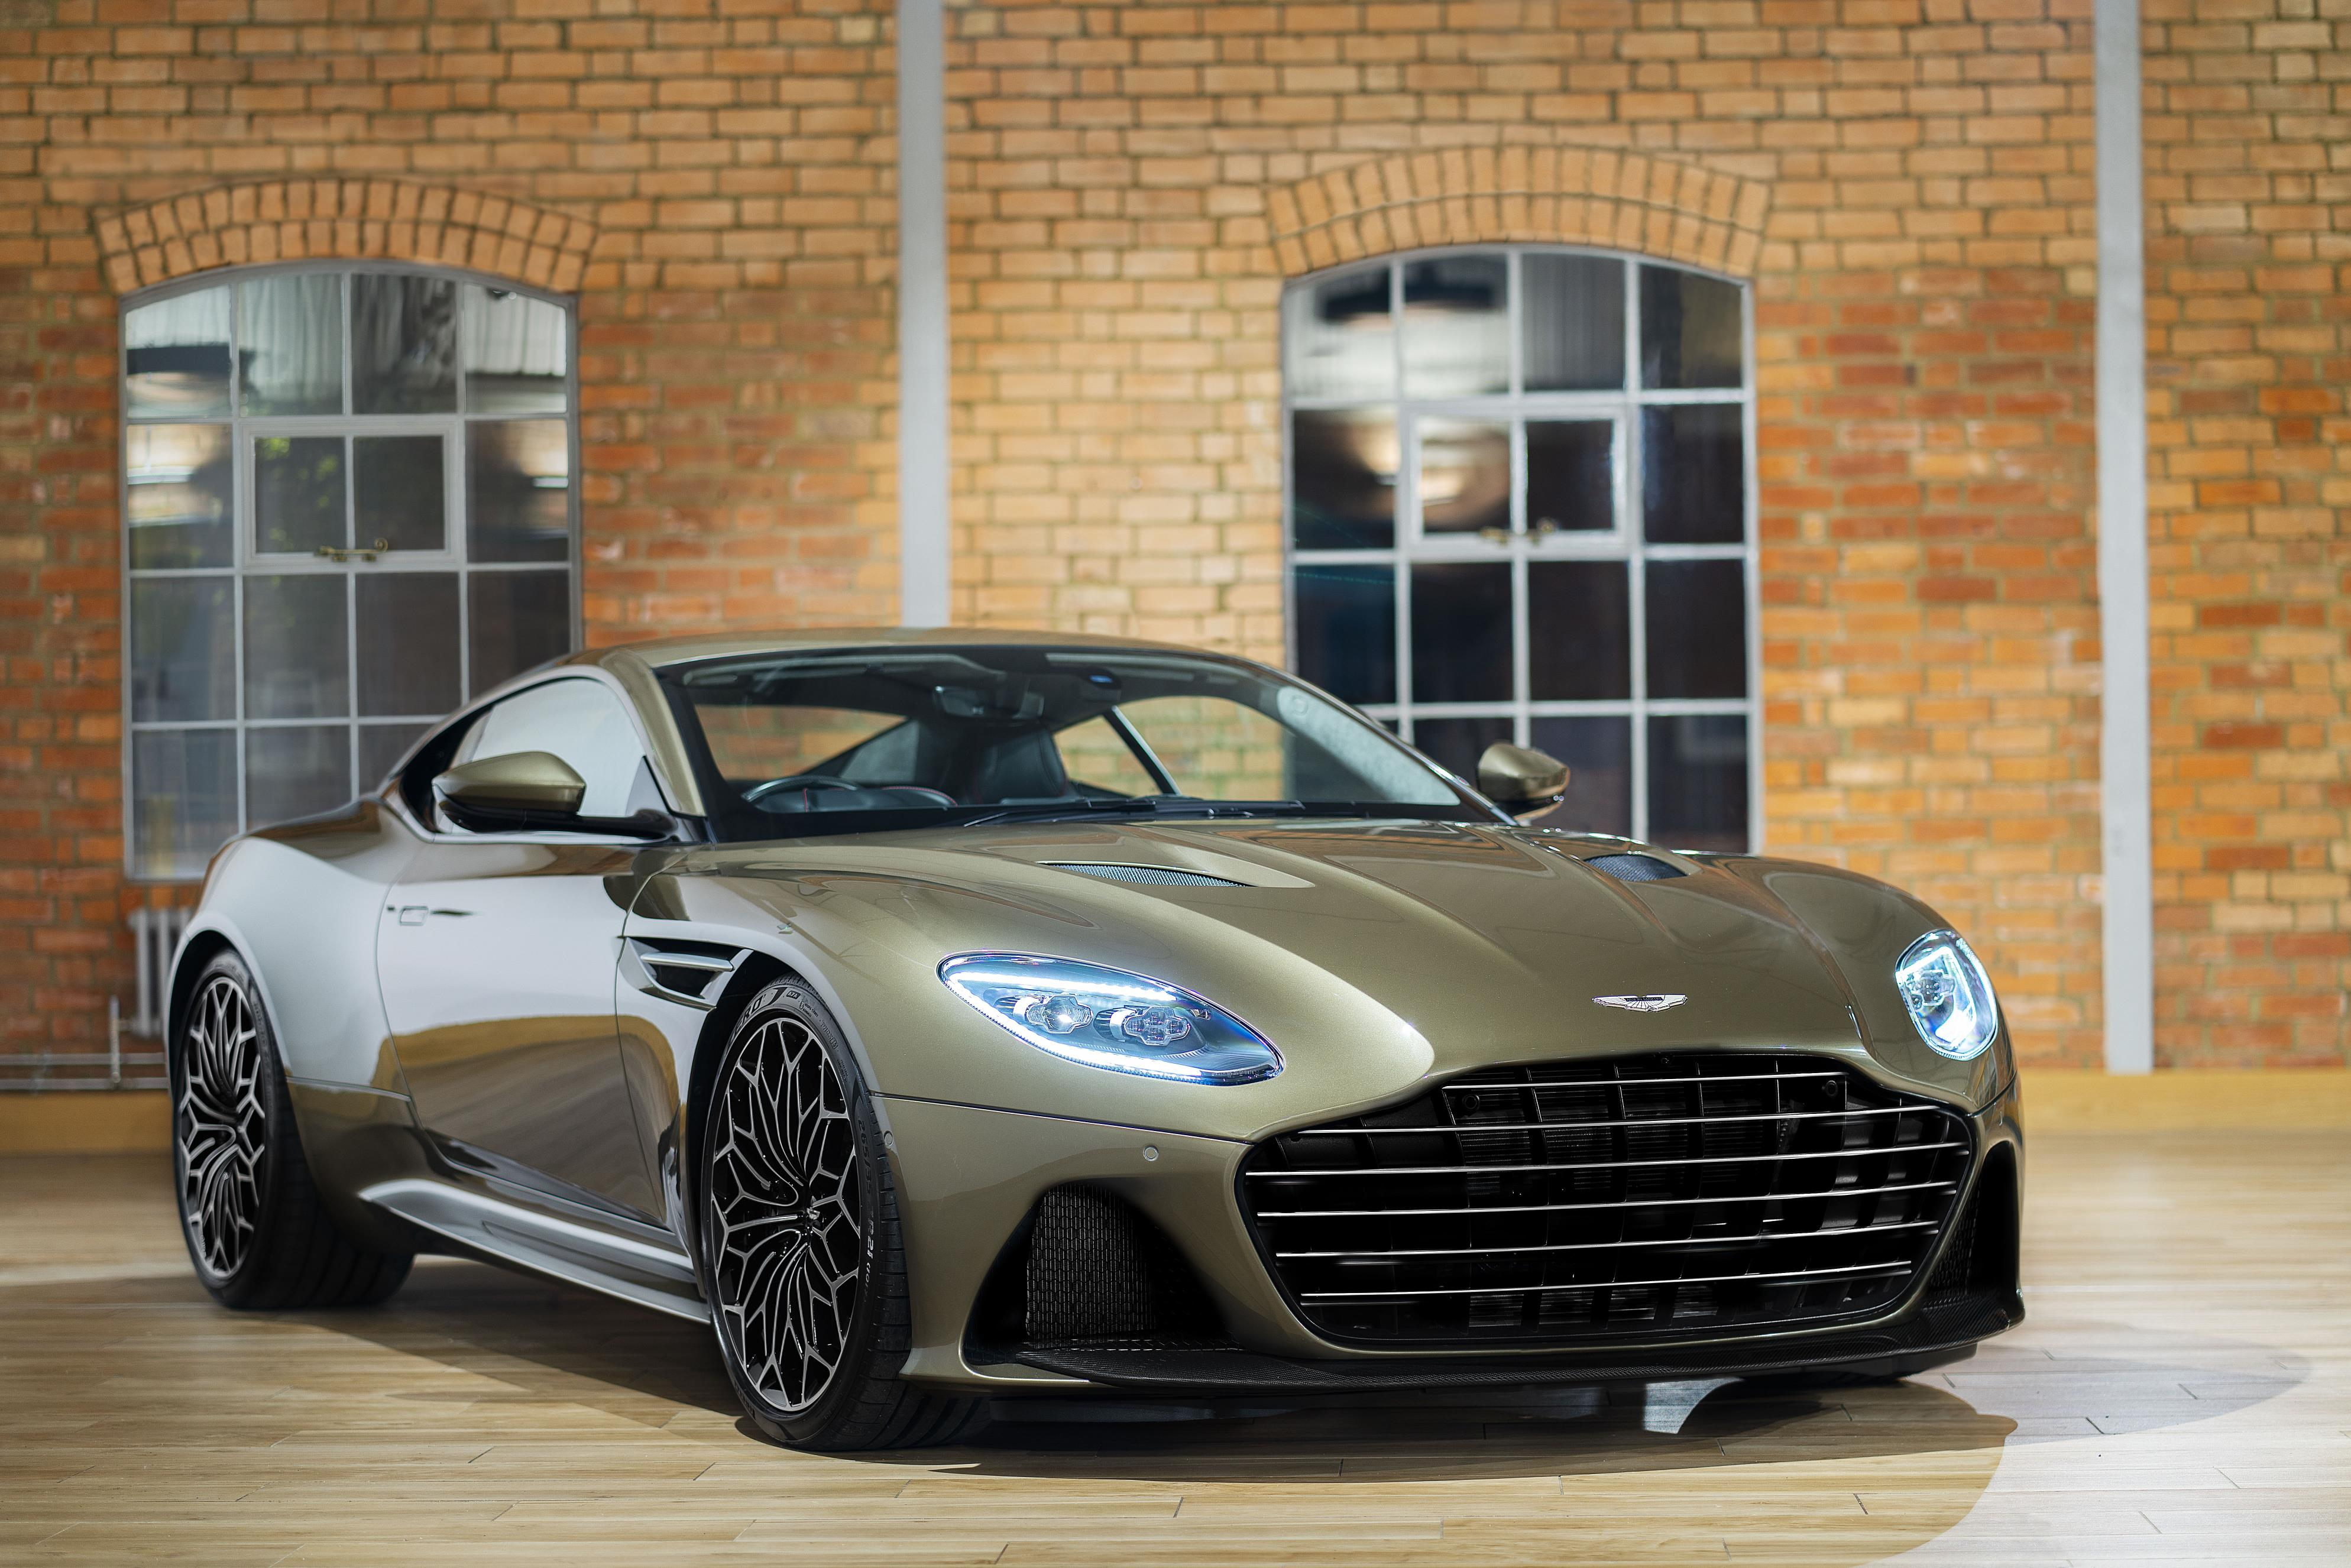 Olive Green Aston Martin DBS Superleggera